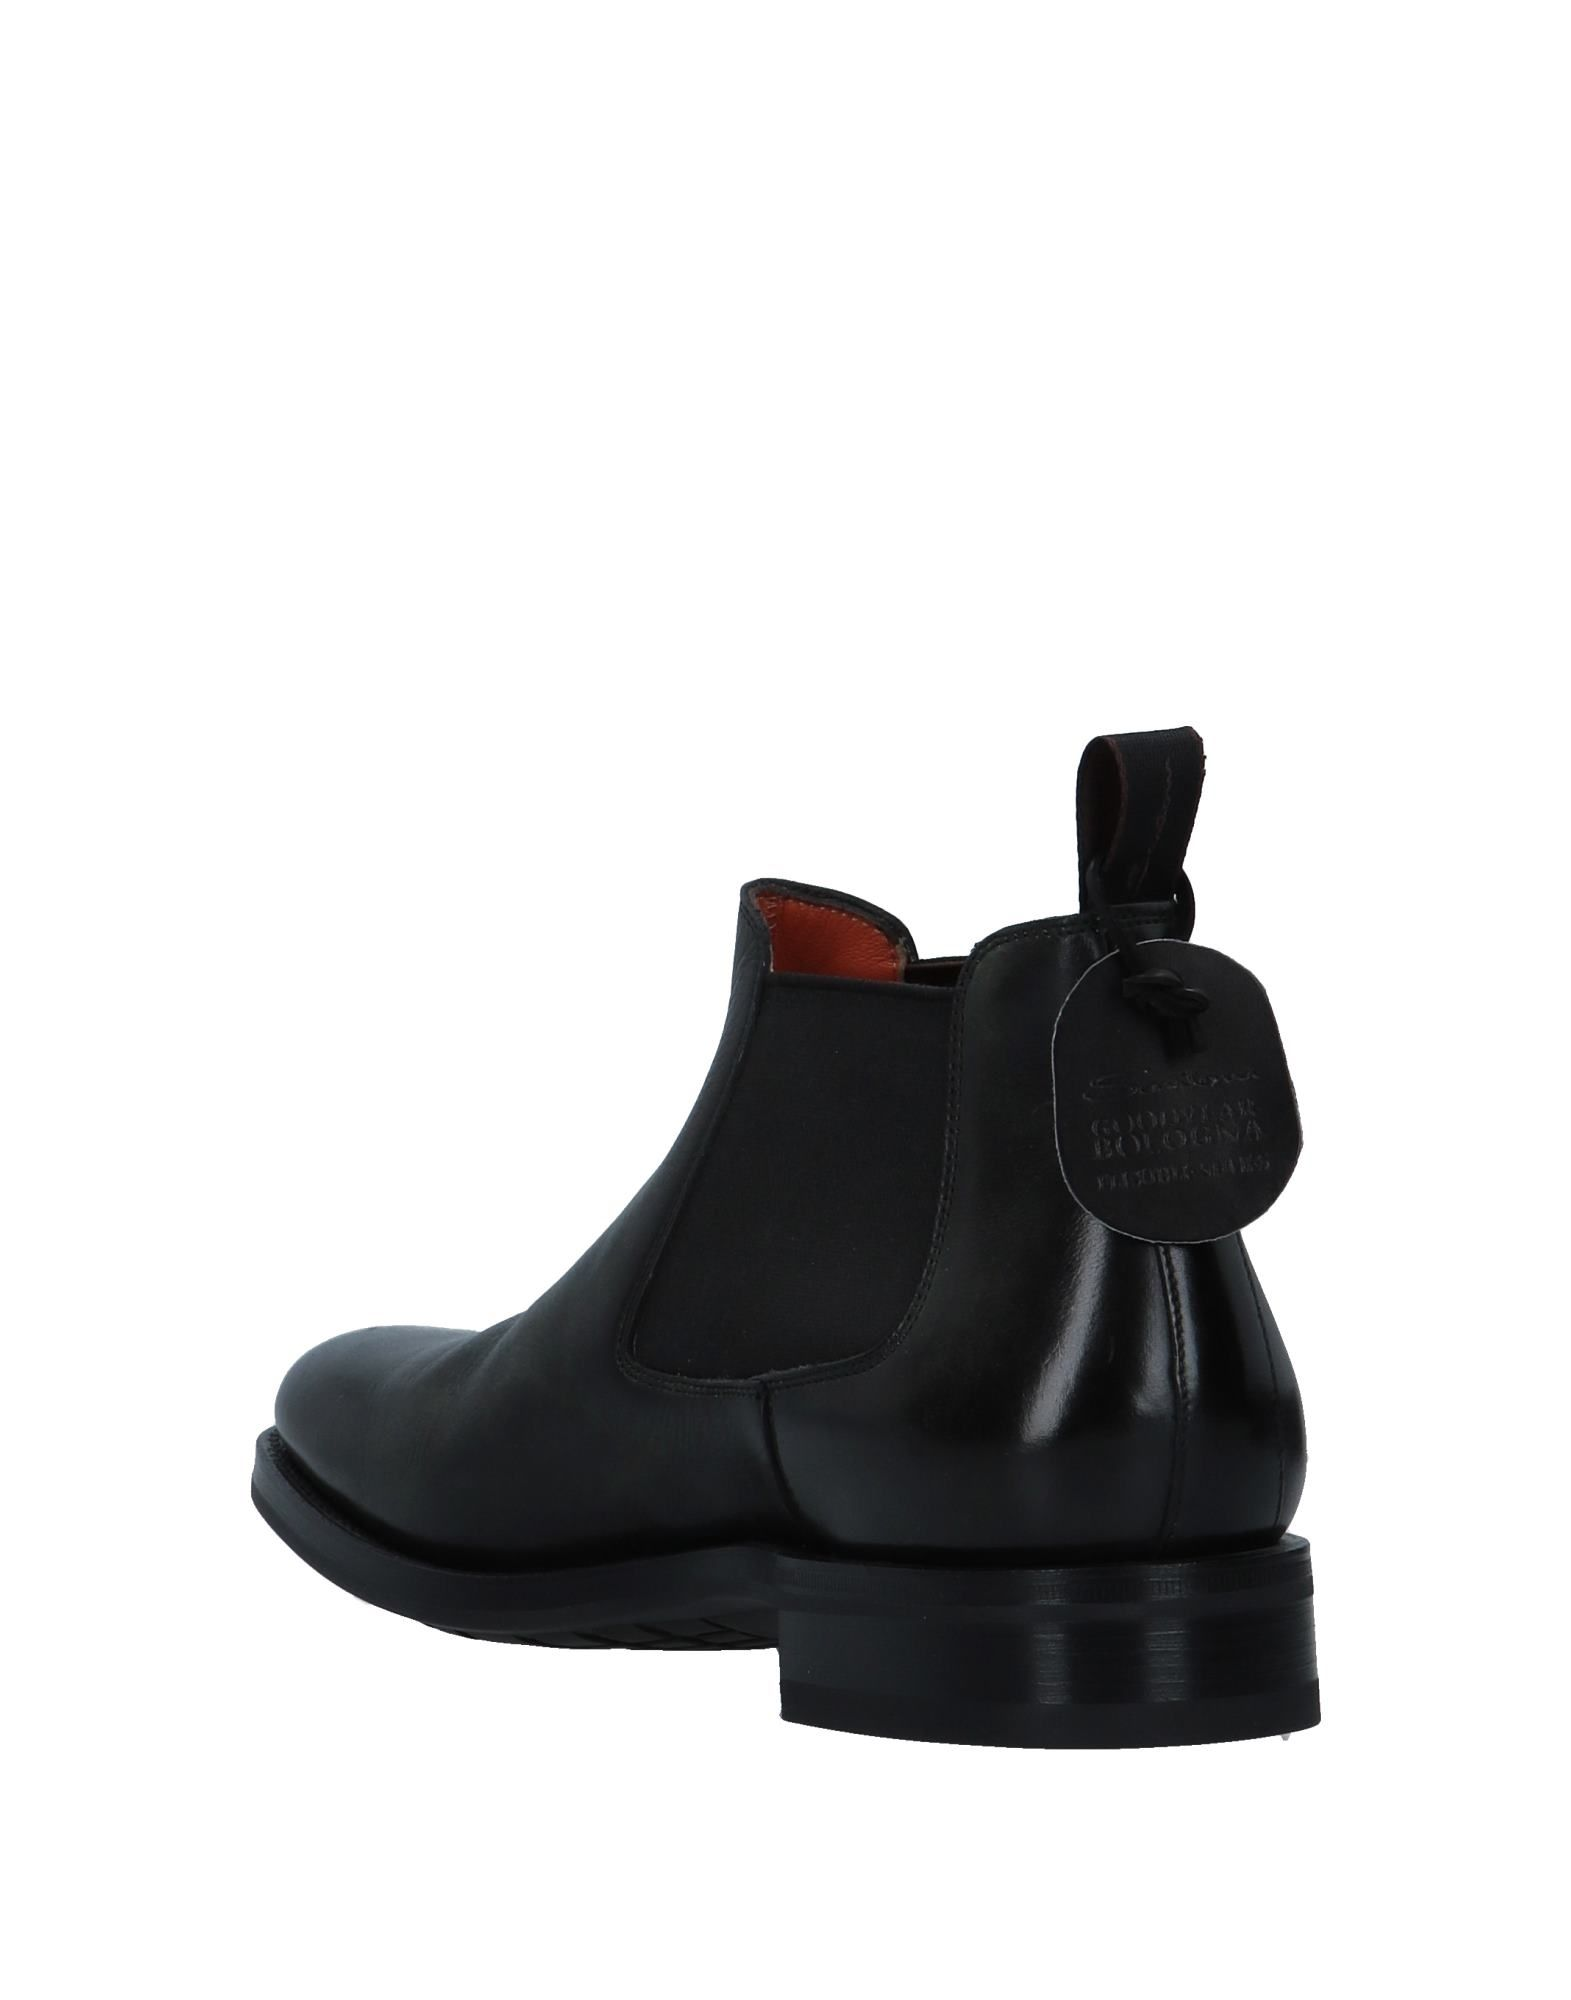 Santoni 11540060OU Stiefelette Herren  11540060OU Santoni Gute Qualität beliebte Schuhe 2a9b76